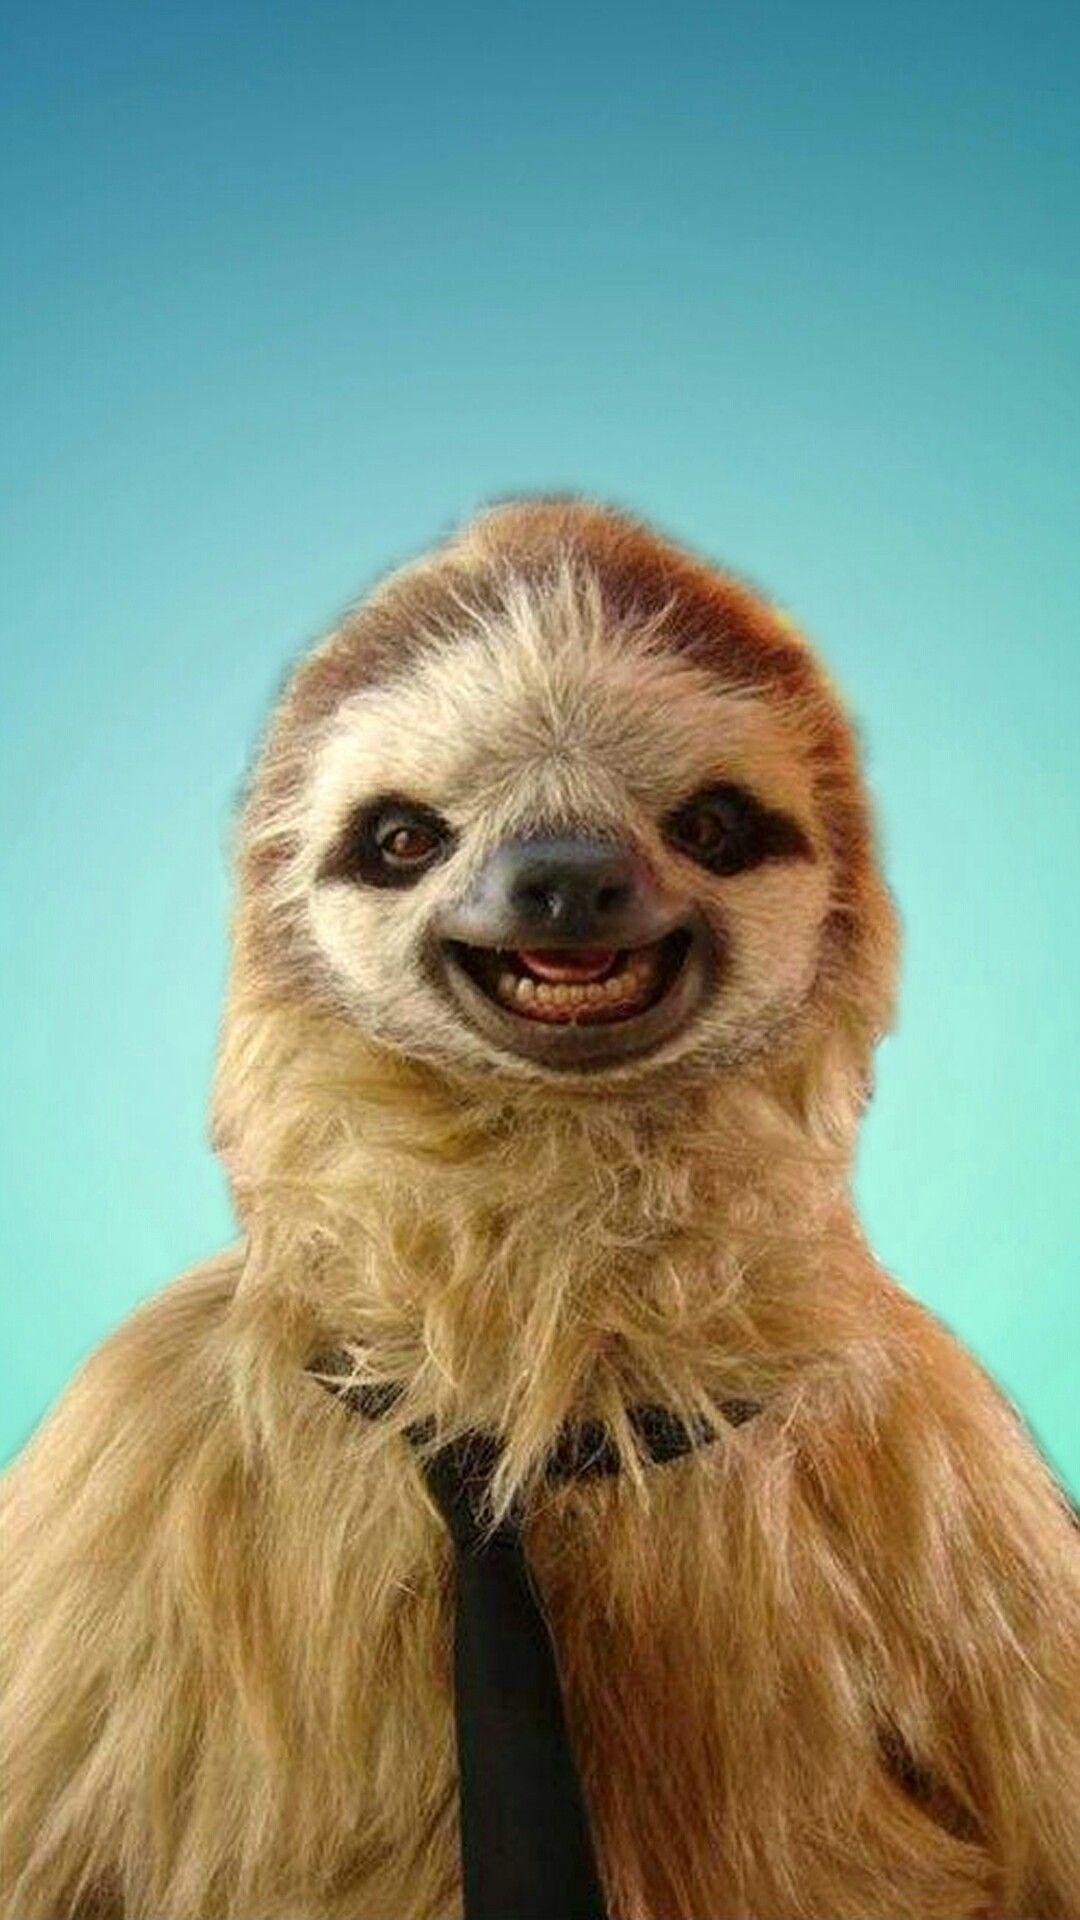 Sloth! A cute sloth phone wallpaper I made. Smiling